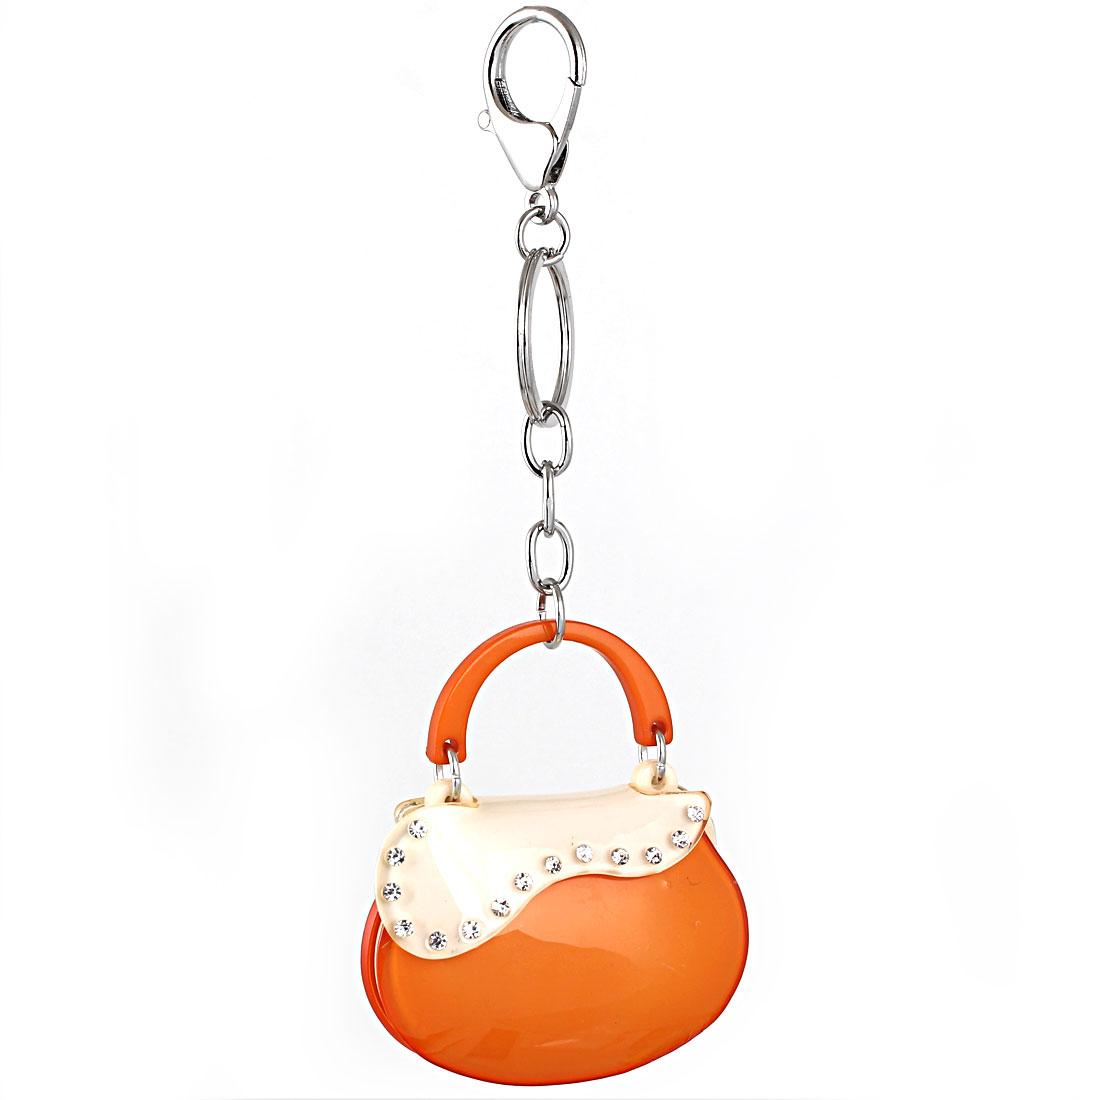 Bag Charm Gift Crystal Handbag Pendant Lobster Clasp Keyring Key Chain Orange